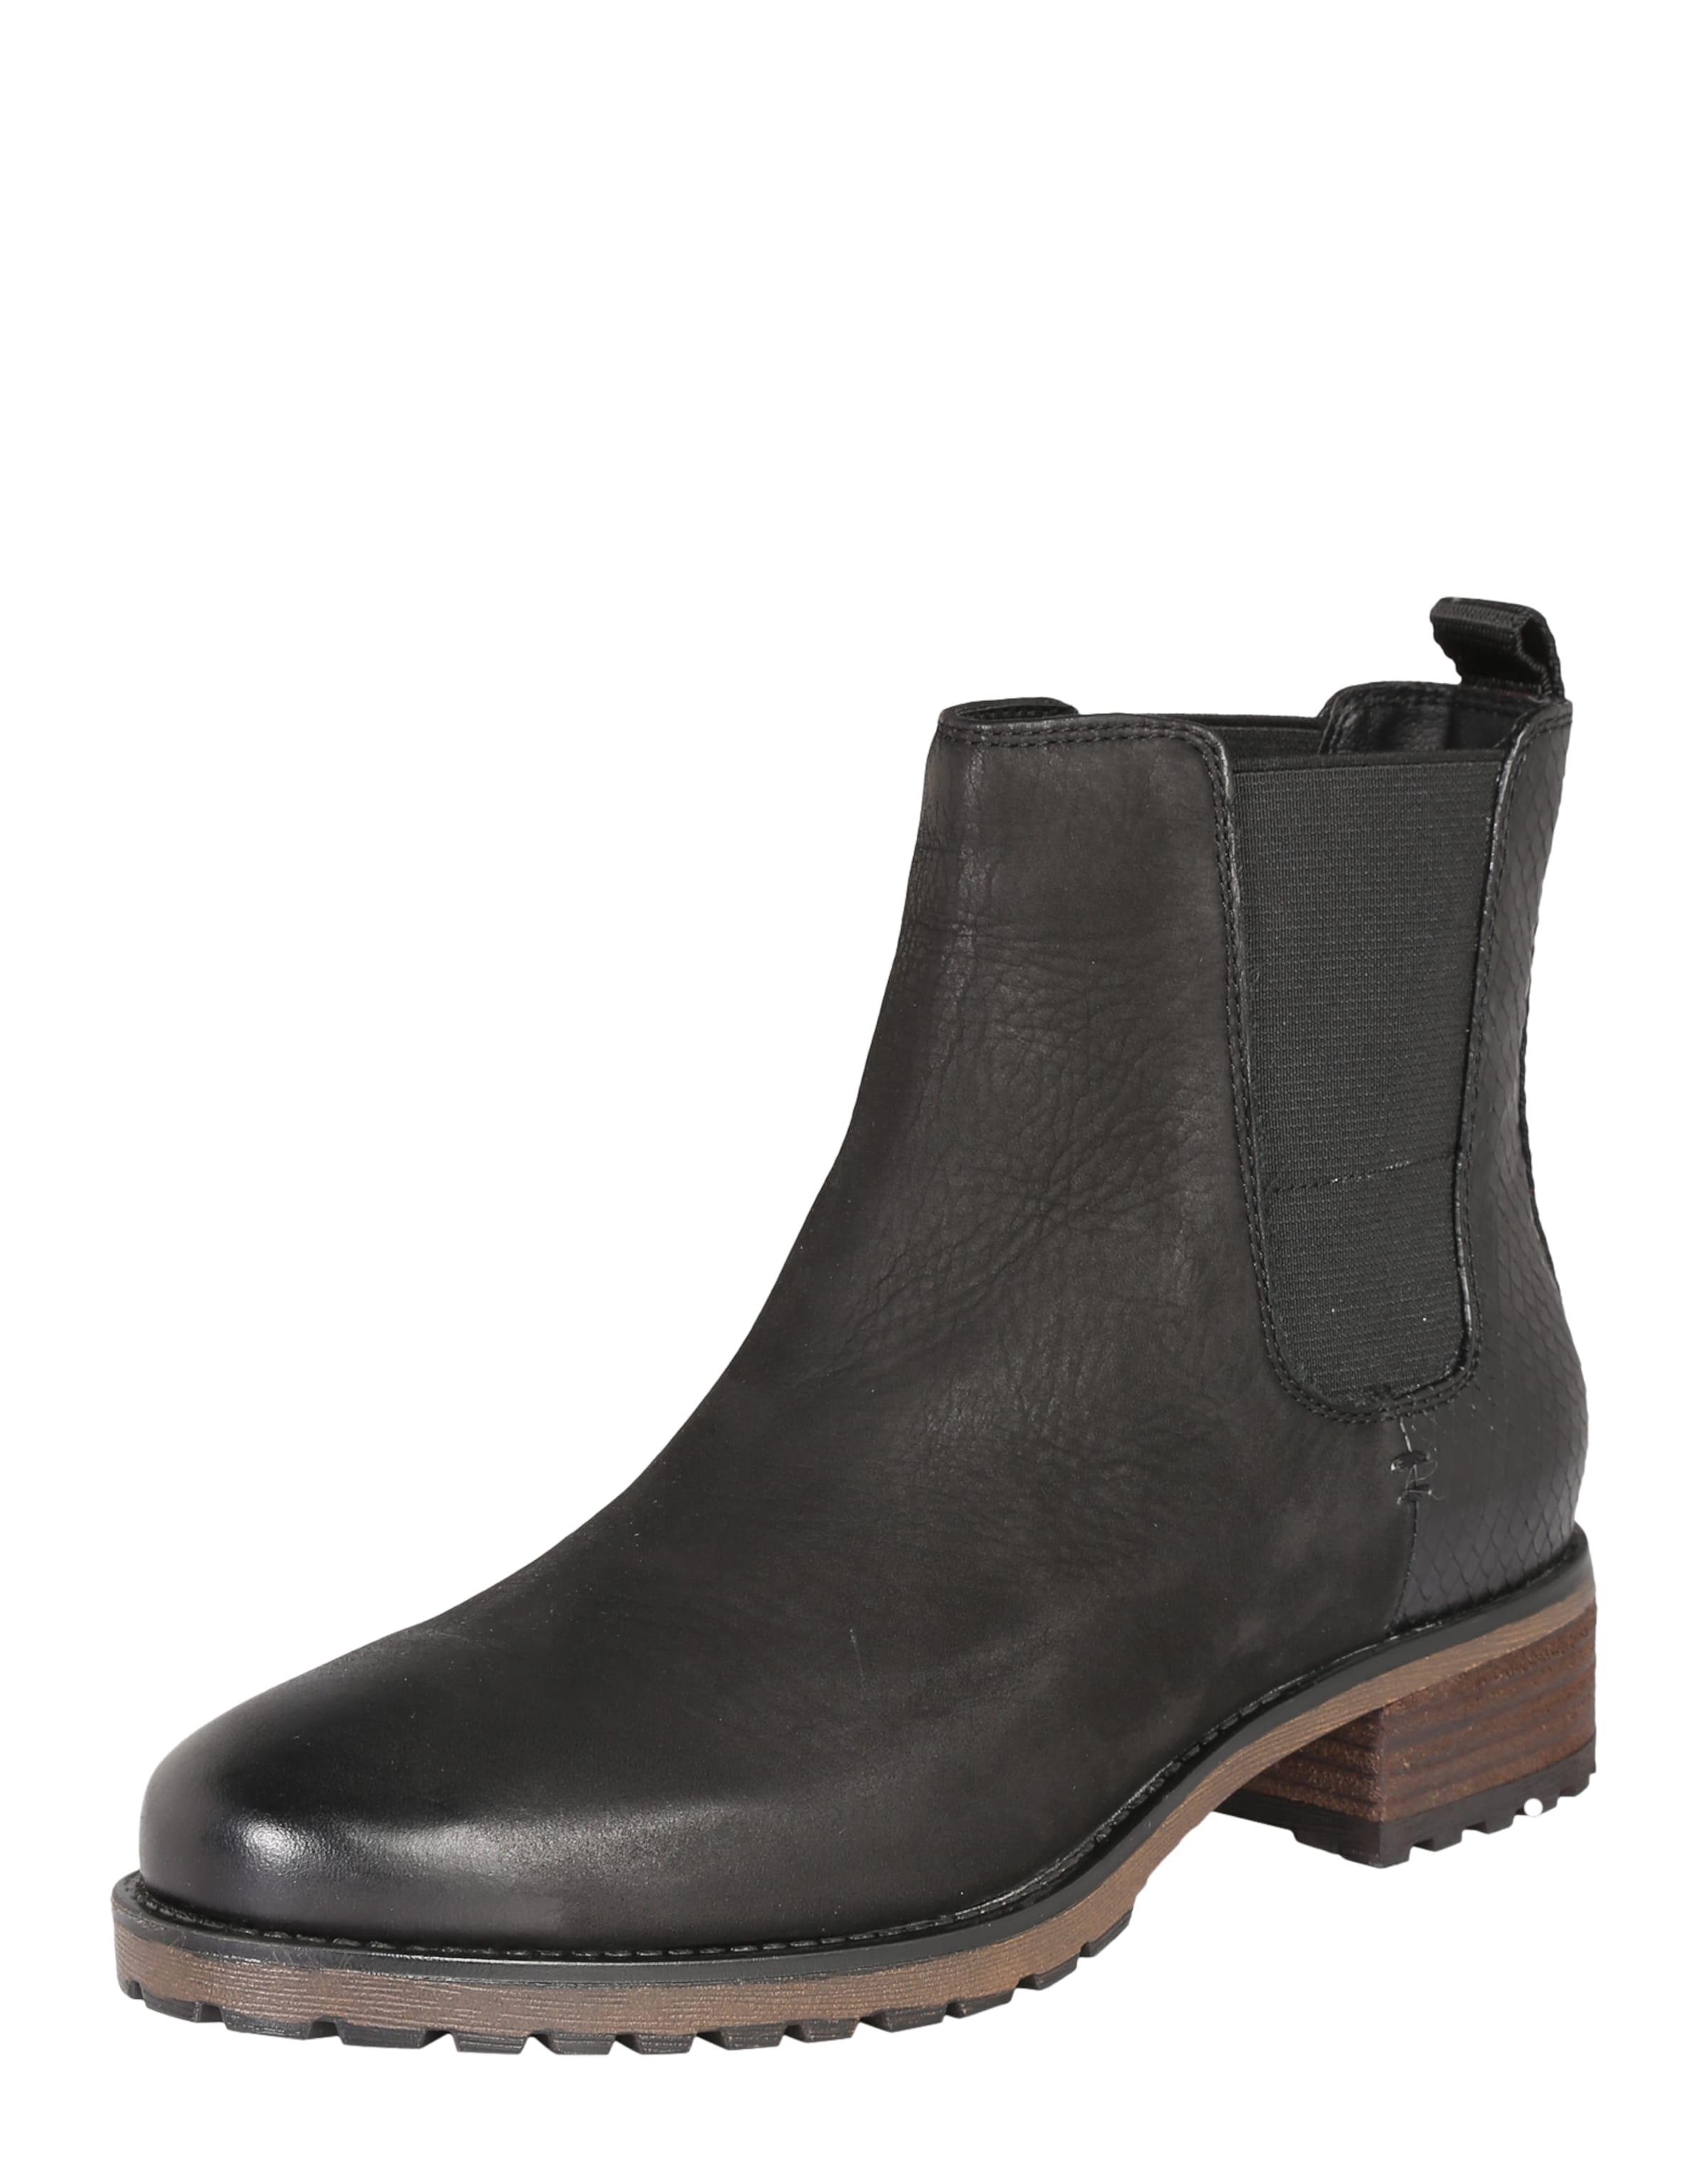 SPM Chelseastiefel Maggy Verschleißfeste billige Schuhe